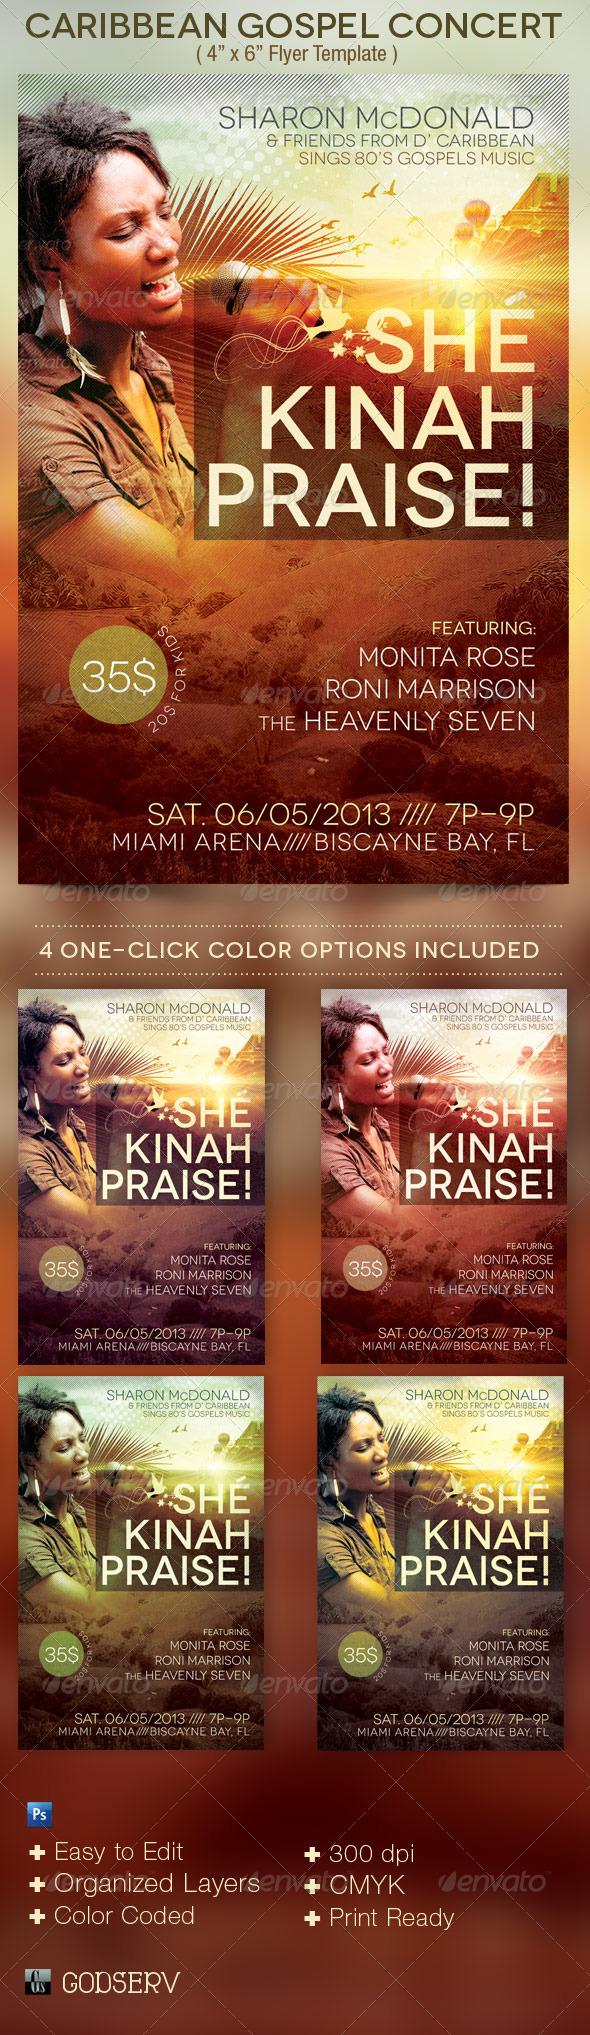 Caribbean Gospel Concert Flyer Template - Church Flyers